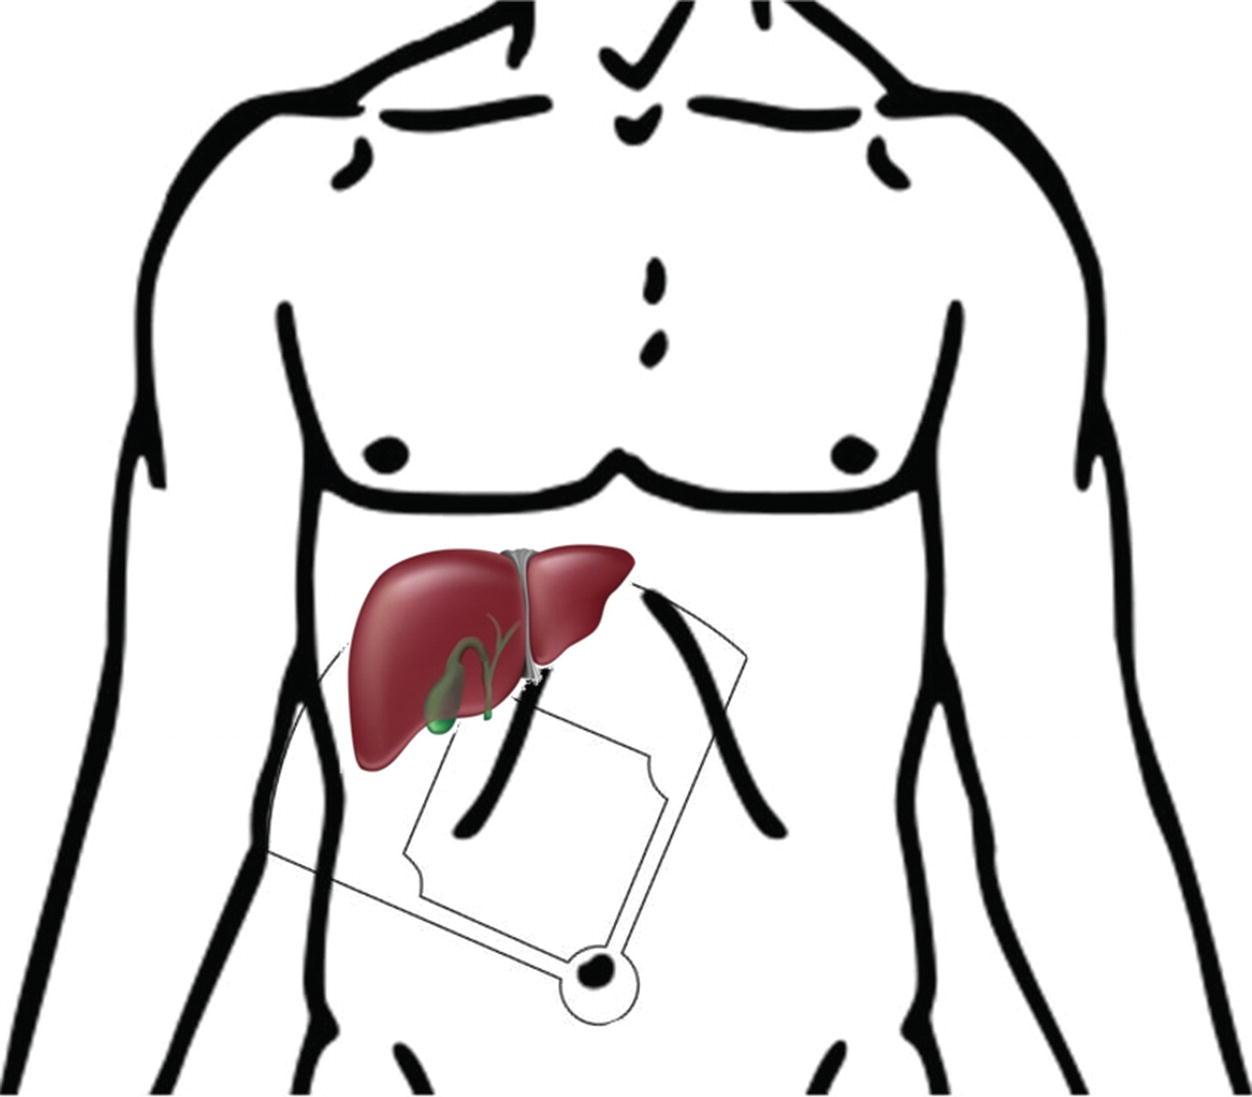 fundamentals of basic laparoscopic setup springerlink Operating Room Staff Nurse Resume open image in new window